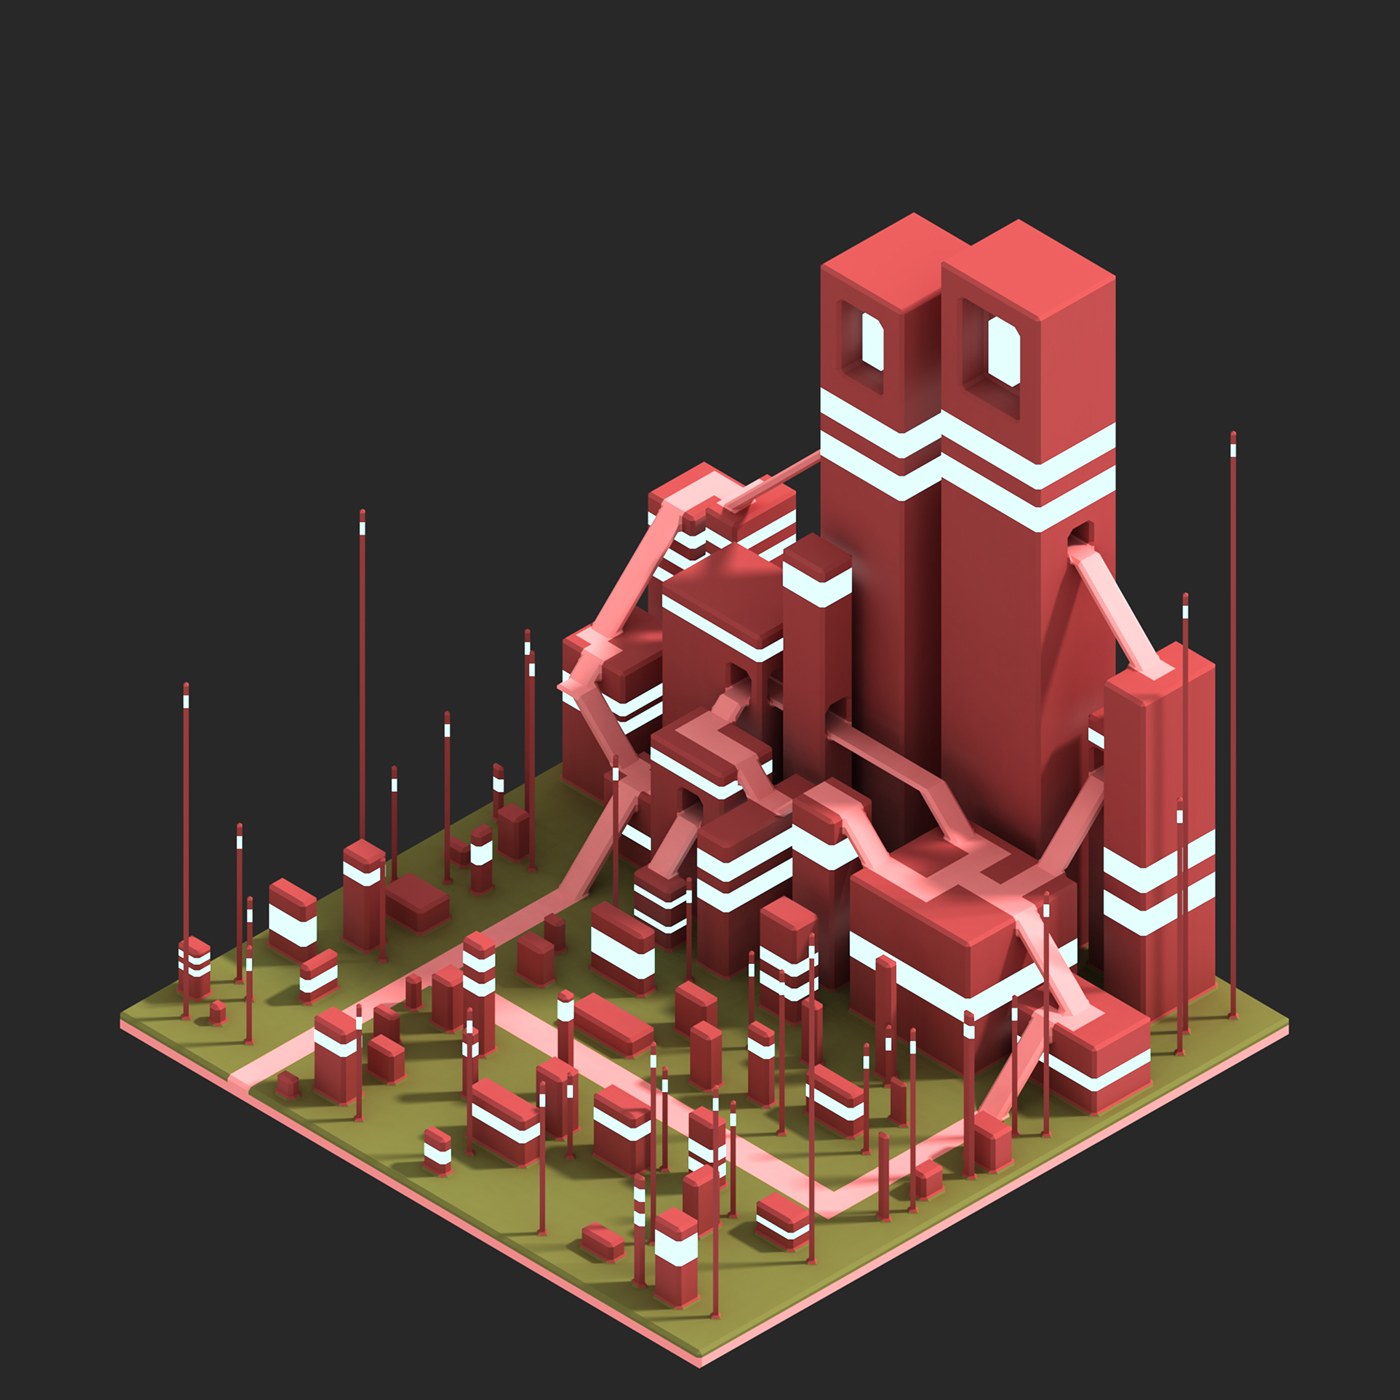 3D voxel Pixel art voxelart design concept gamedev game monument Isometric